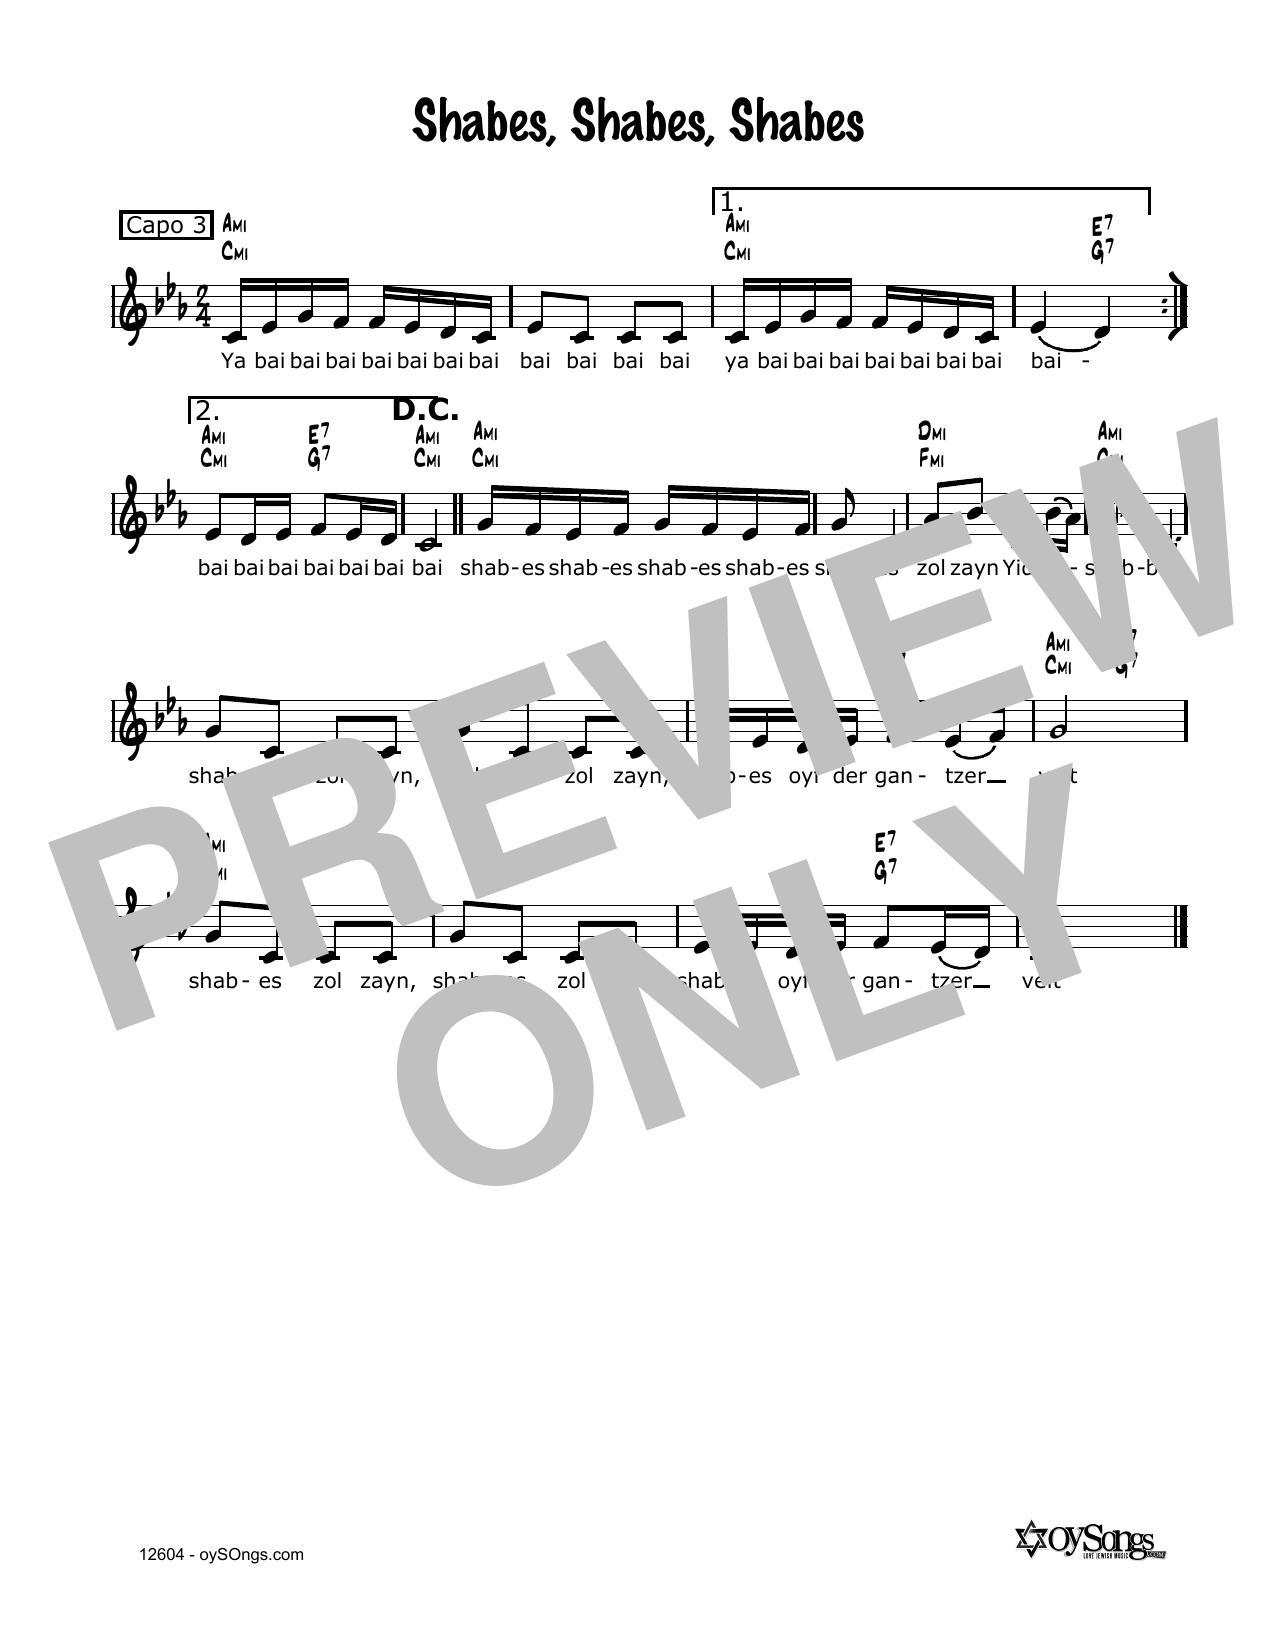 Shabbos Yid'n Zol Zain Sheet Music